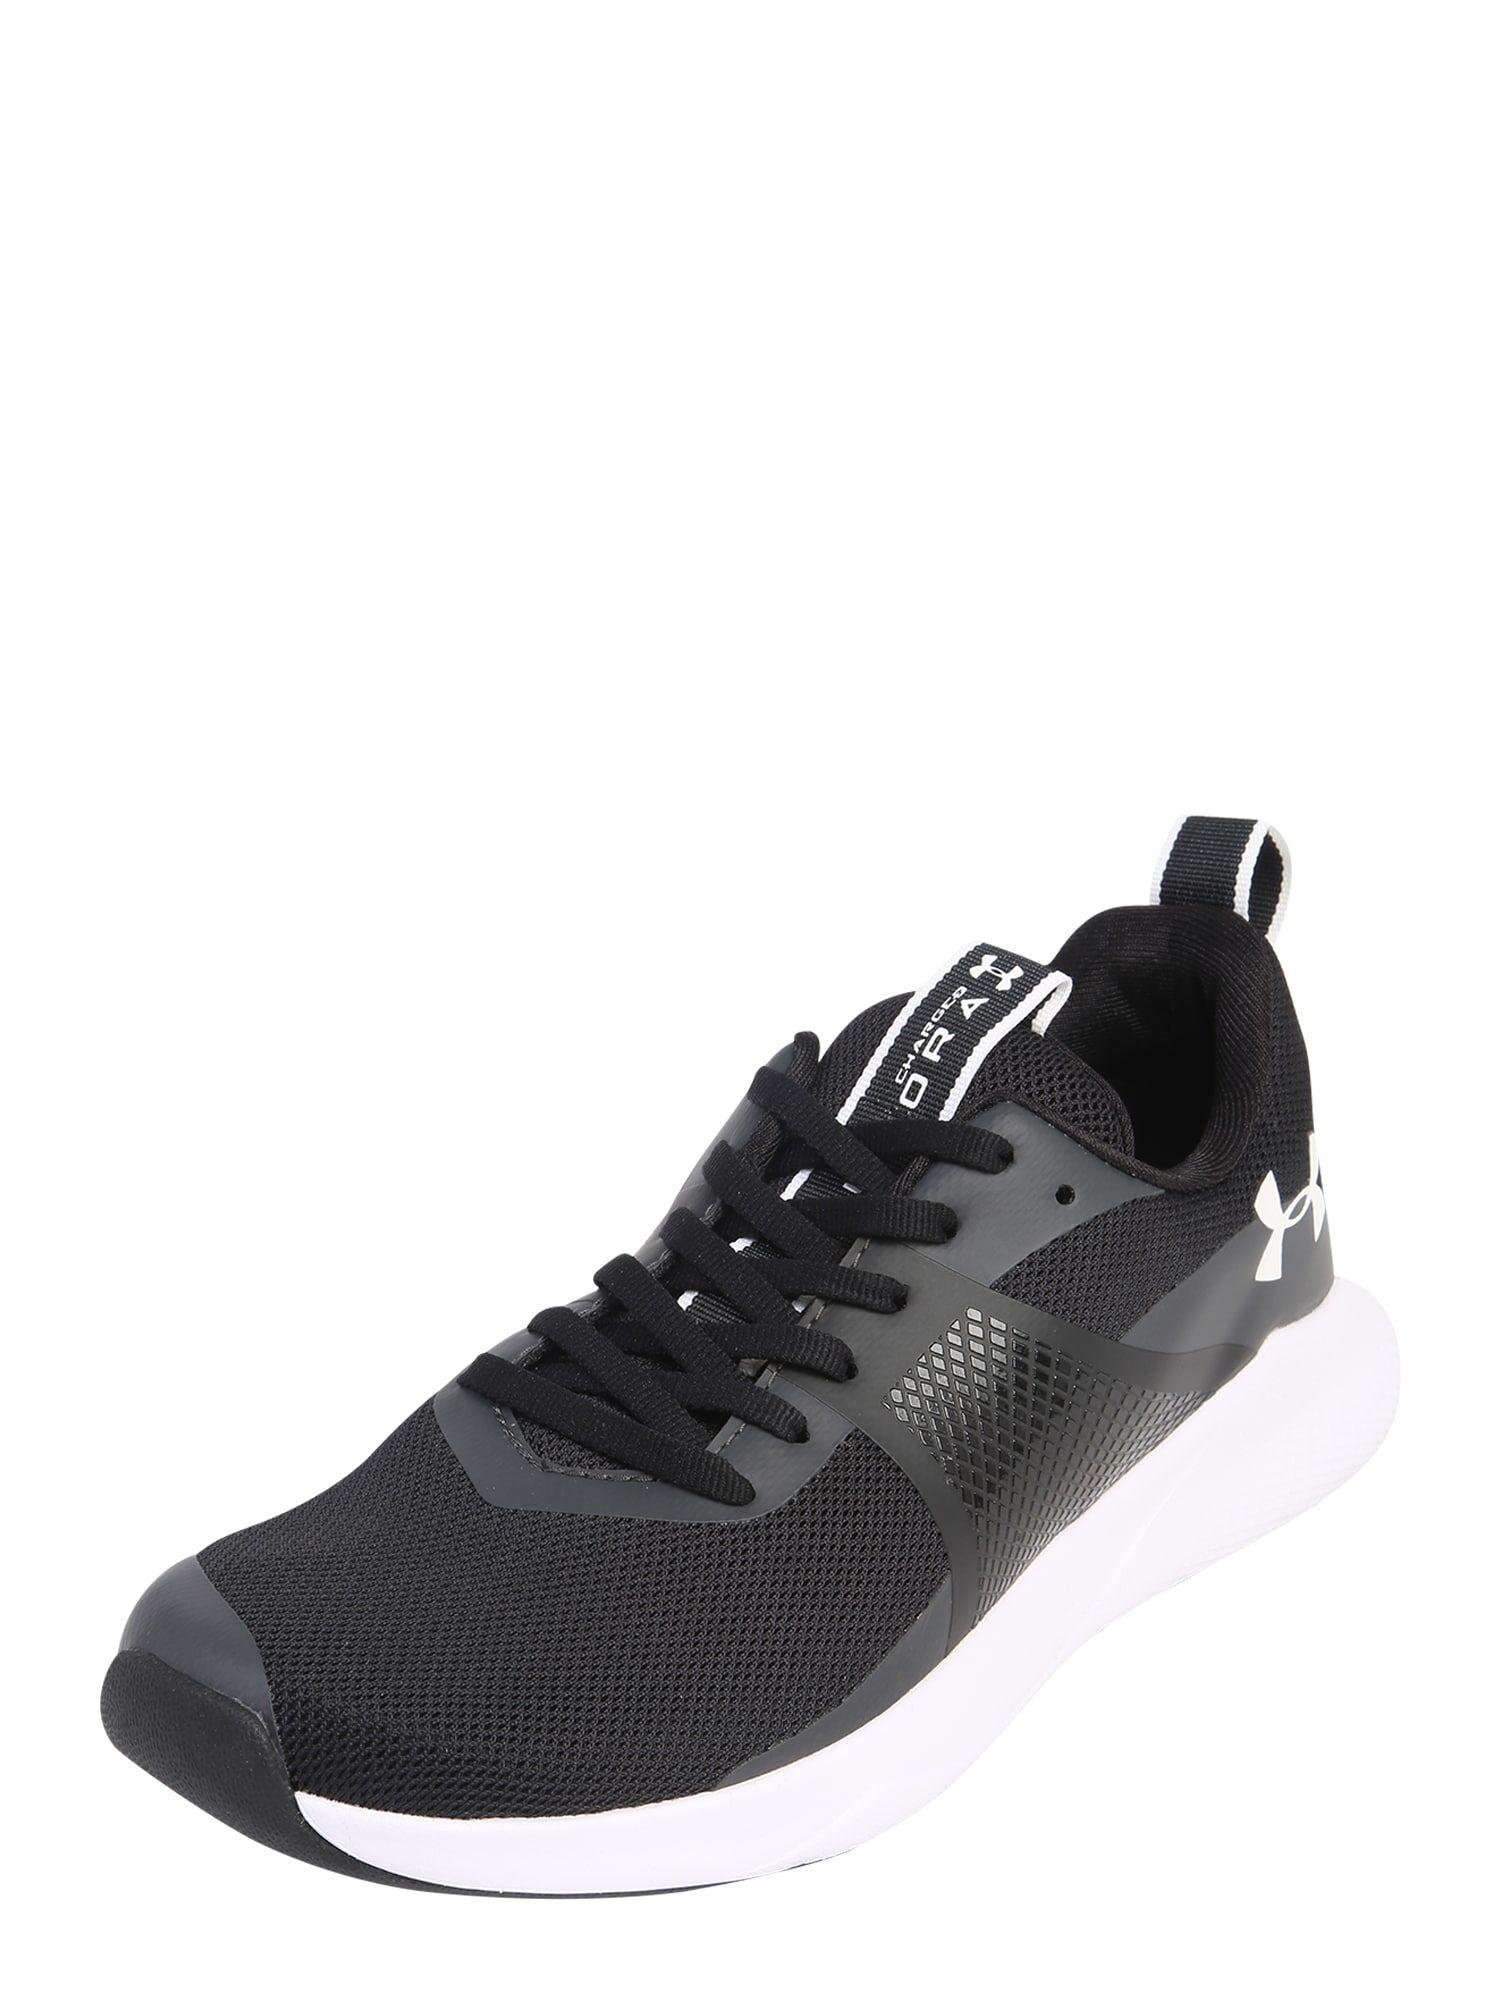 UNDER ARMOUR Chaussure de sport 'Aurora'  - Noir - Taille: 8 - female